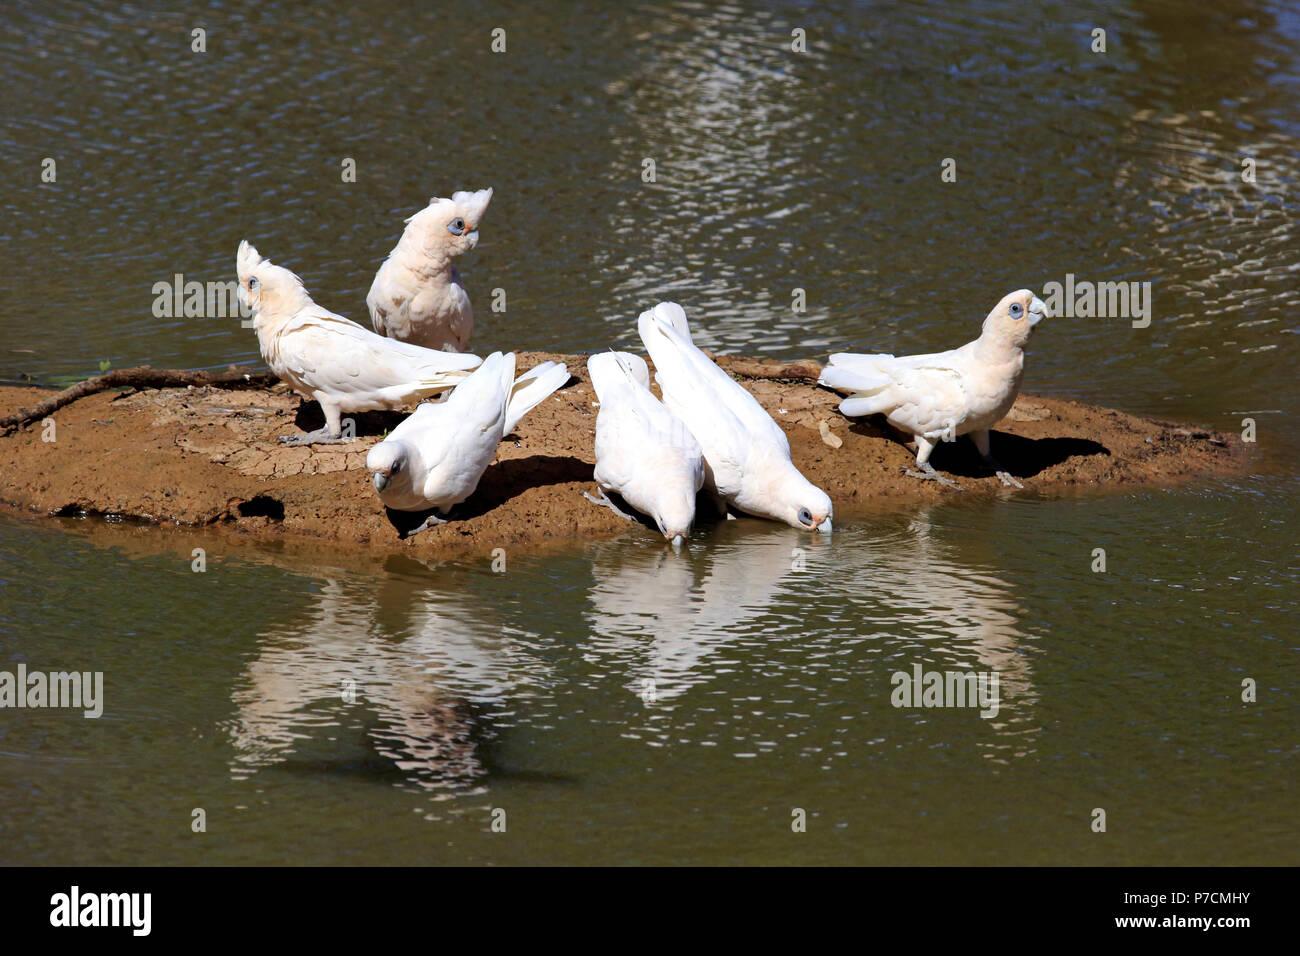 Little Corella, bare-eyed cockatoo, blood-stained cockatoo, short-billed corella, little cockatoo, blue-eyed cockatoo, group at water, Sturt Nationalpark, New South Wales, Australia, (Cacatua sanguinea) - Stock Image